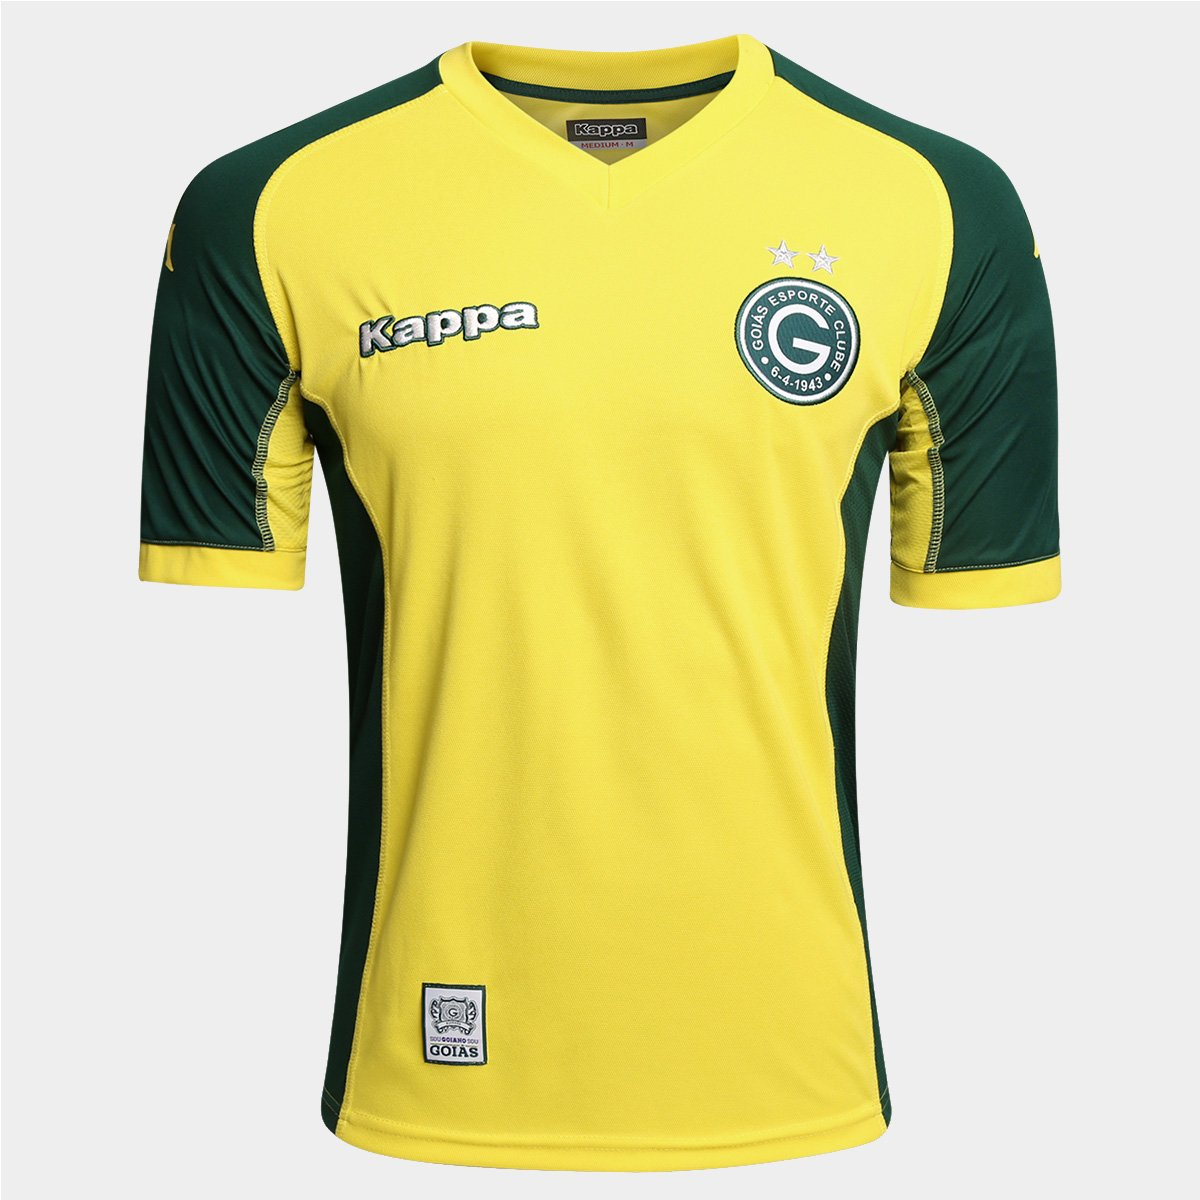 Camisa Goiás Goleiro 2015 s nº - Torcedor Kappa Masculina - Compre Agora  0af84a476df3f